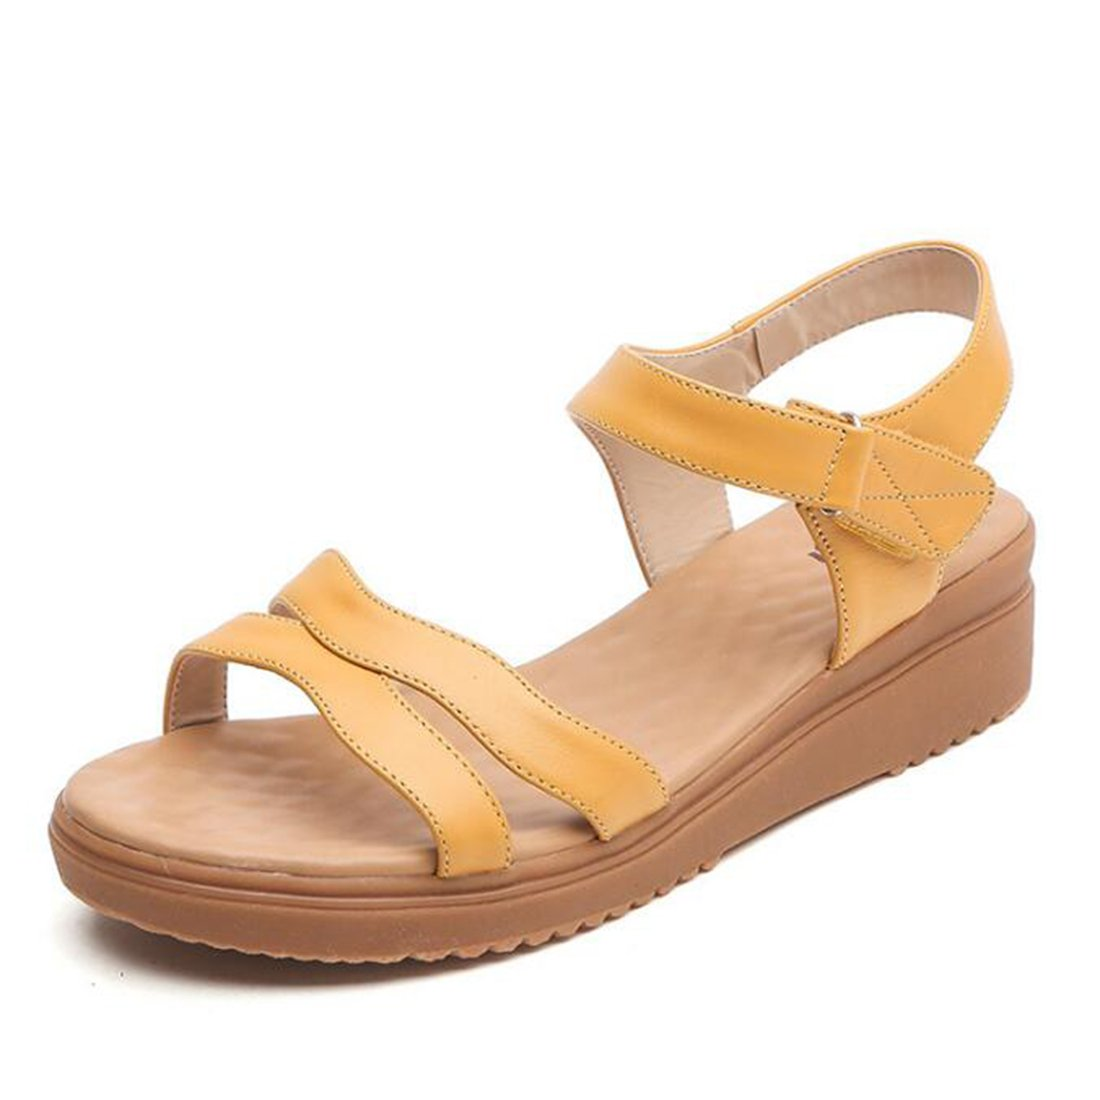 ZHONGST Frau Sommer Leder Sandalen Casual Fashion Plattform Atmungs Sandalen  36|Yellow